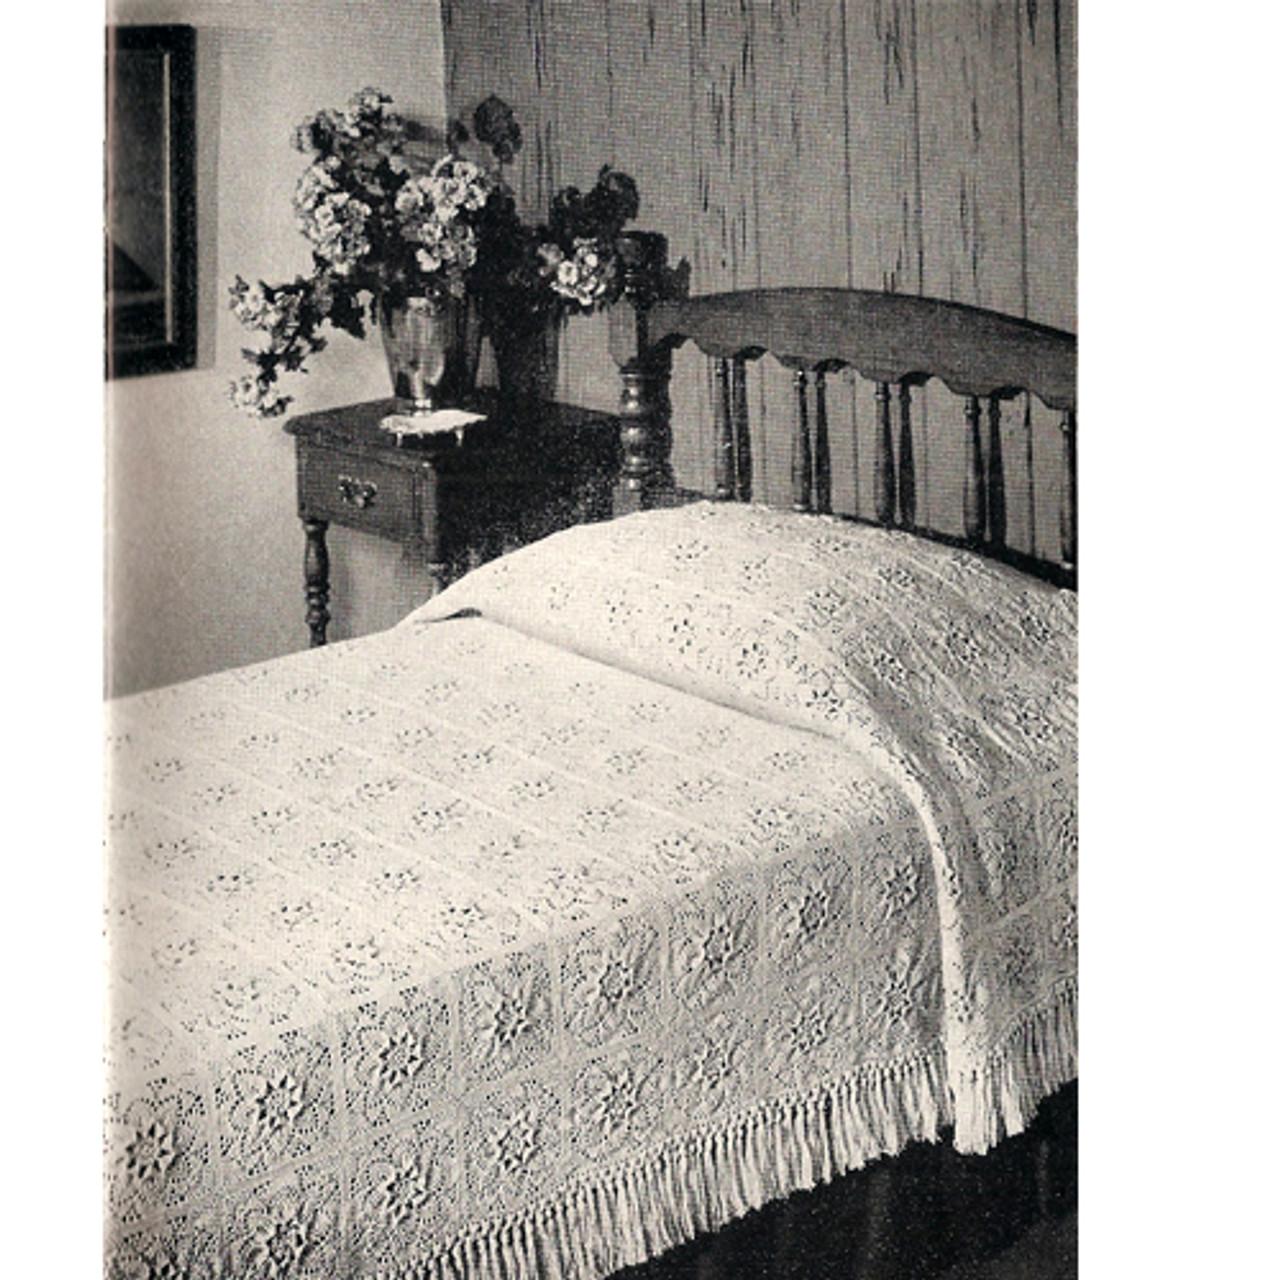 Crocheted Puritan Bedspread Pattern from American Thread